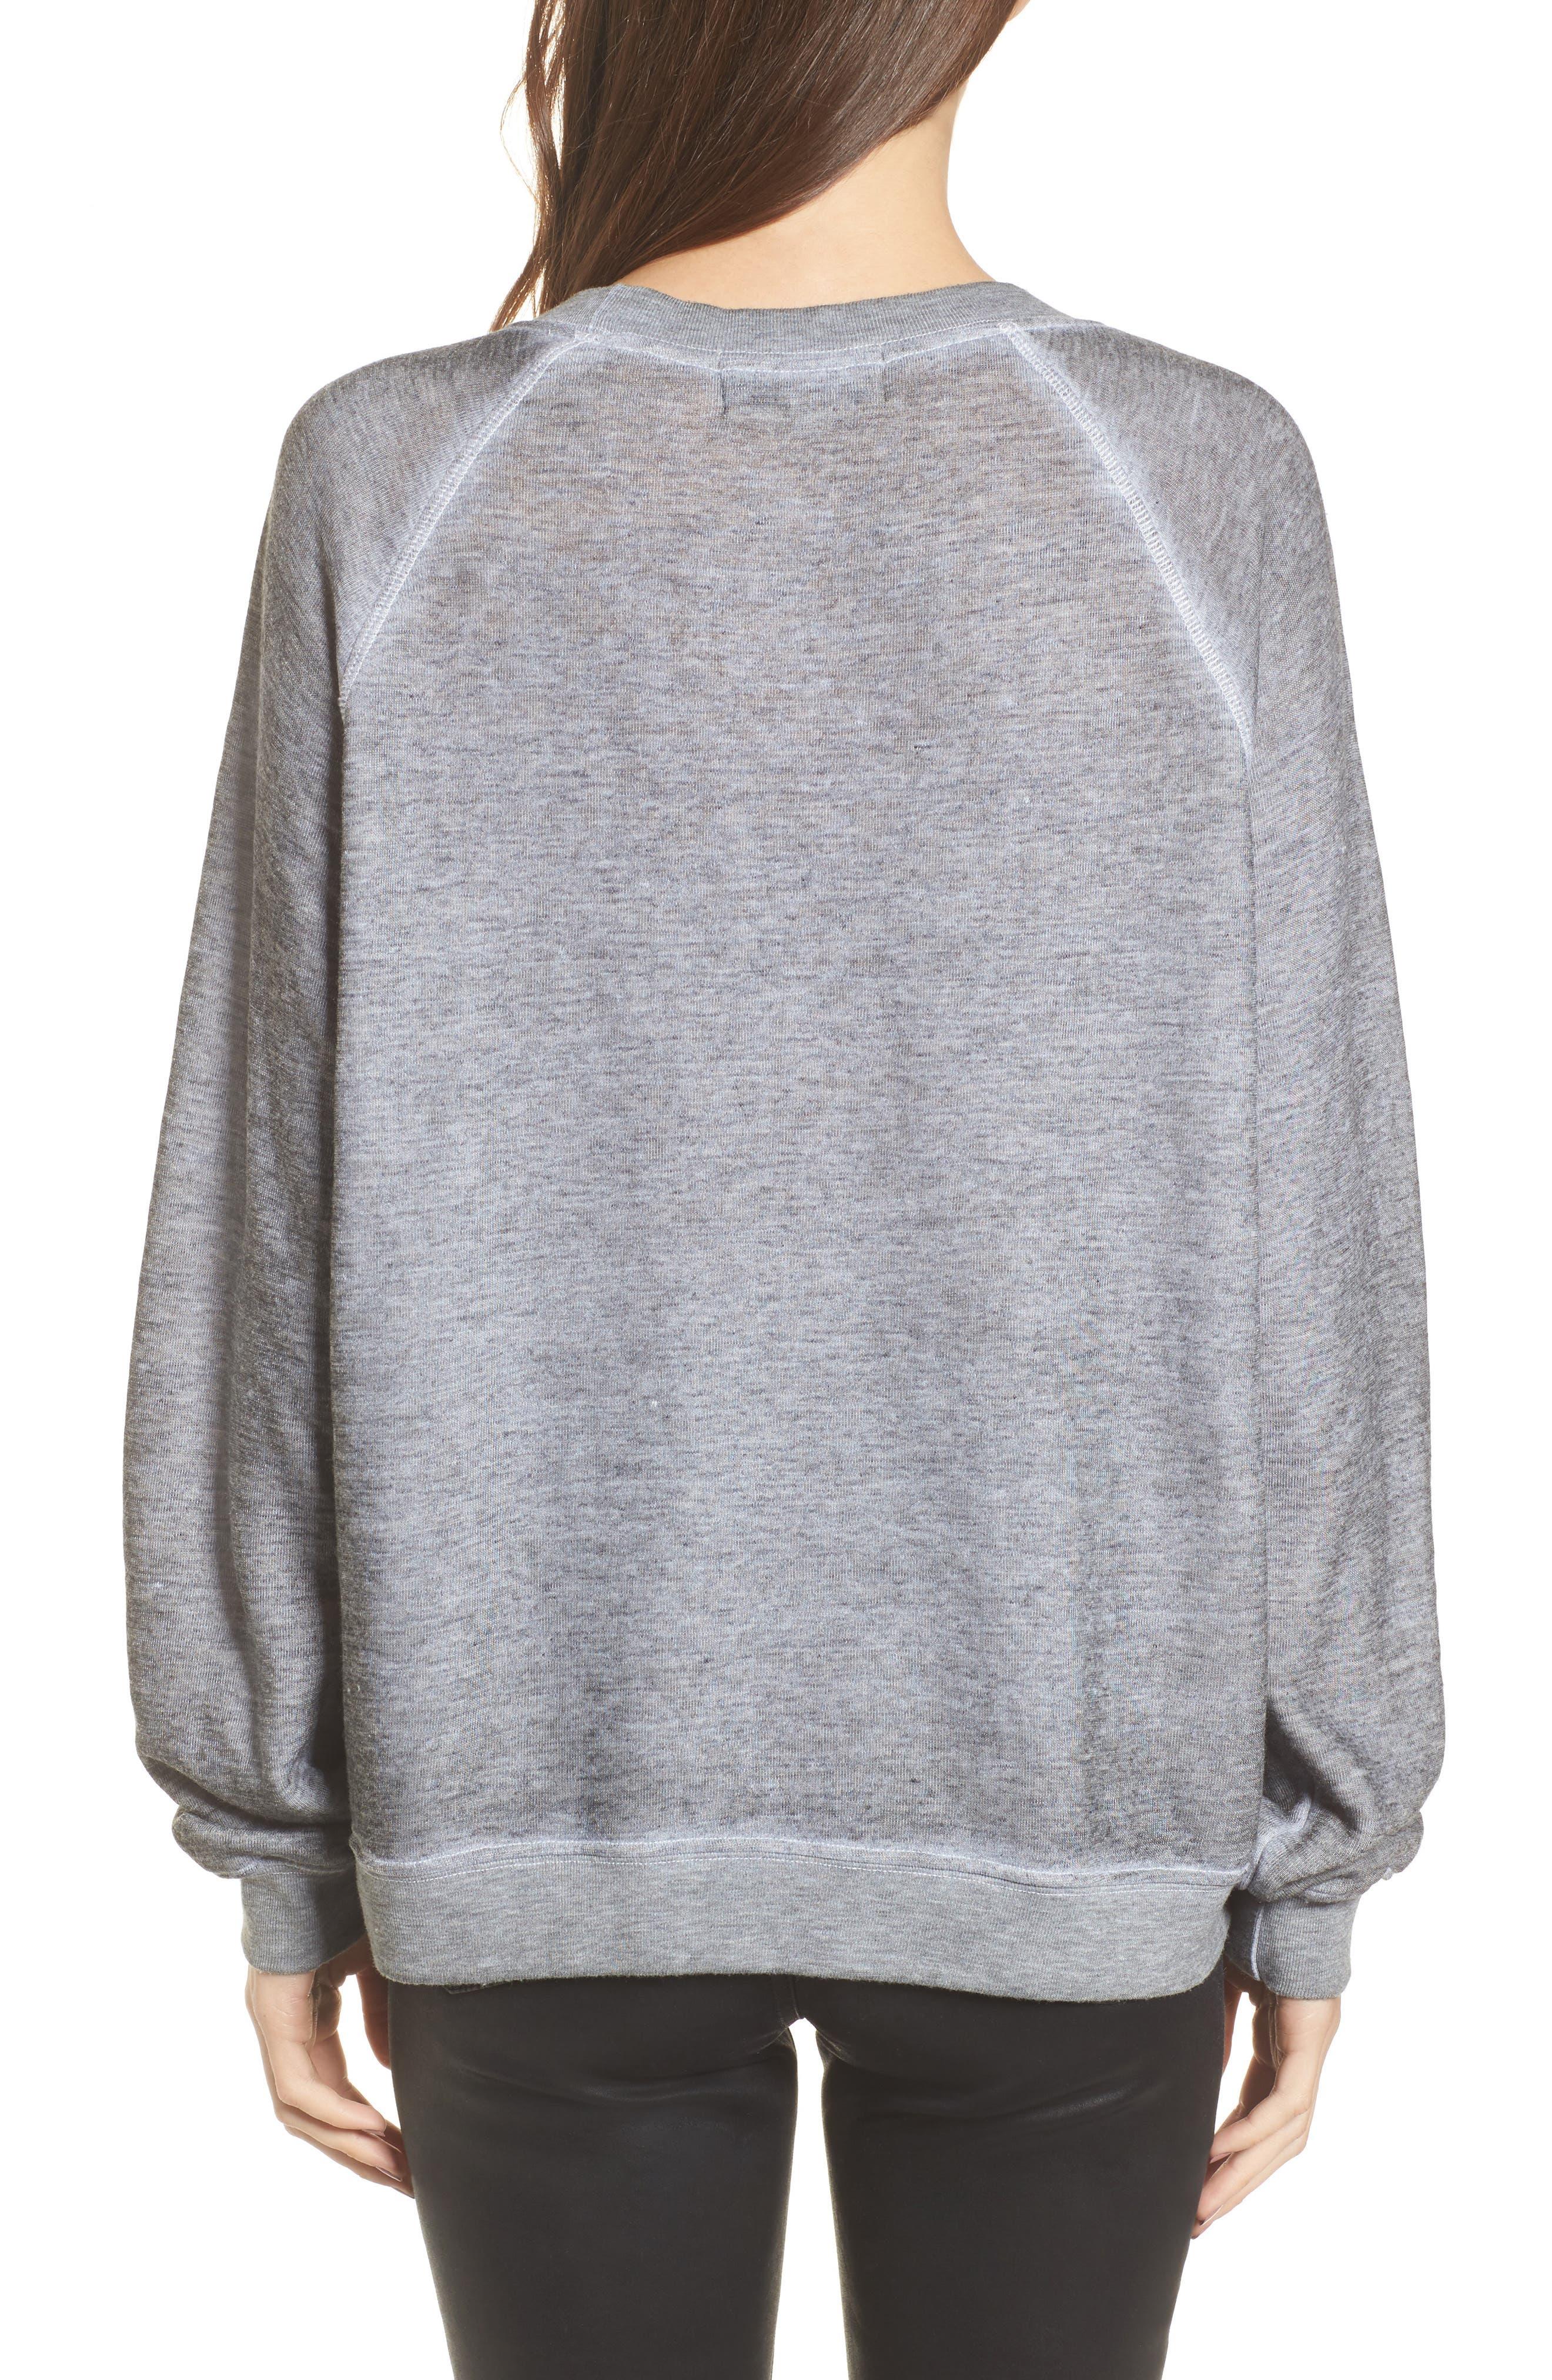 Weekend Millionaire Sweatshirt,                             Alternate thumbnail 2, color,                             020